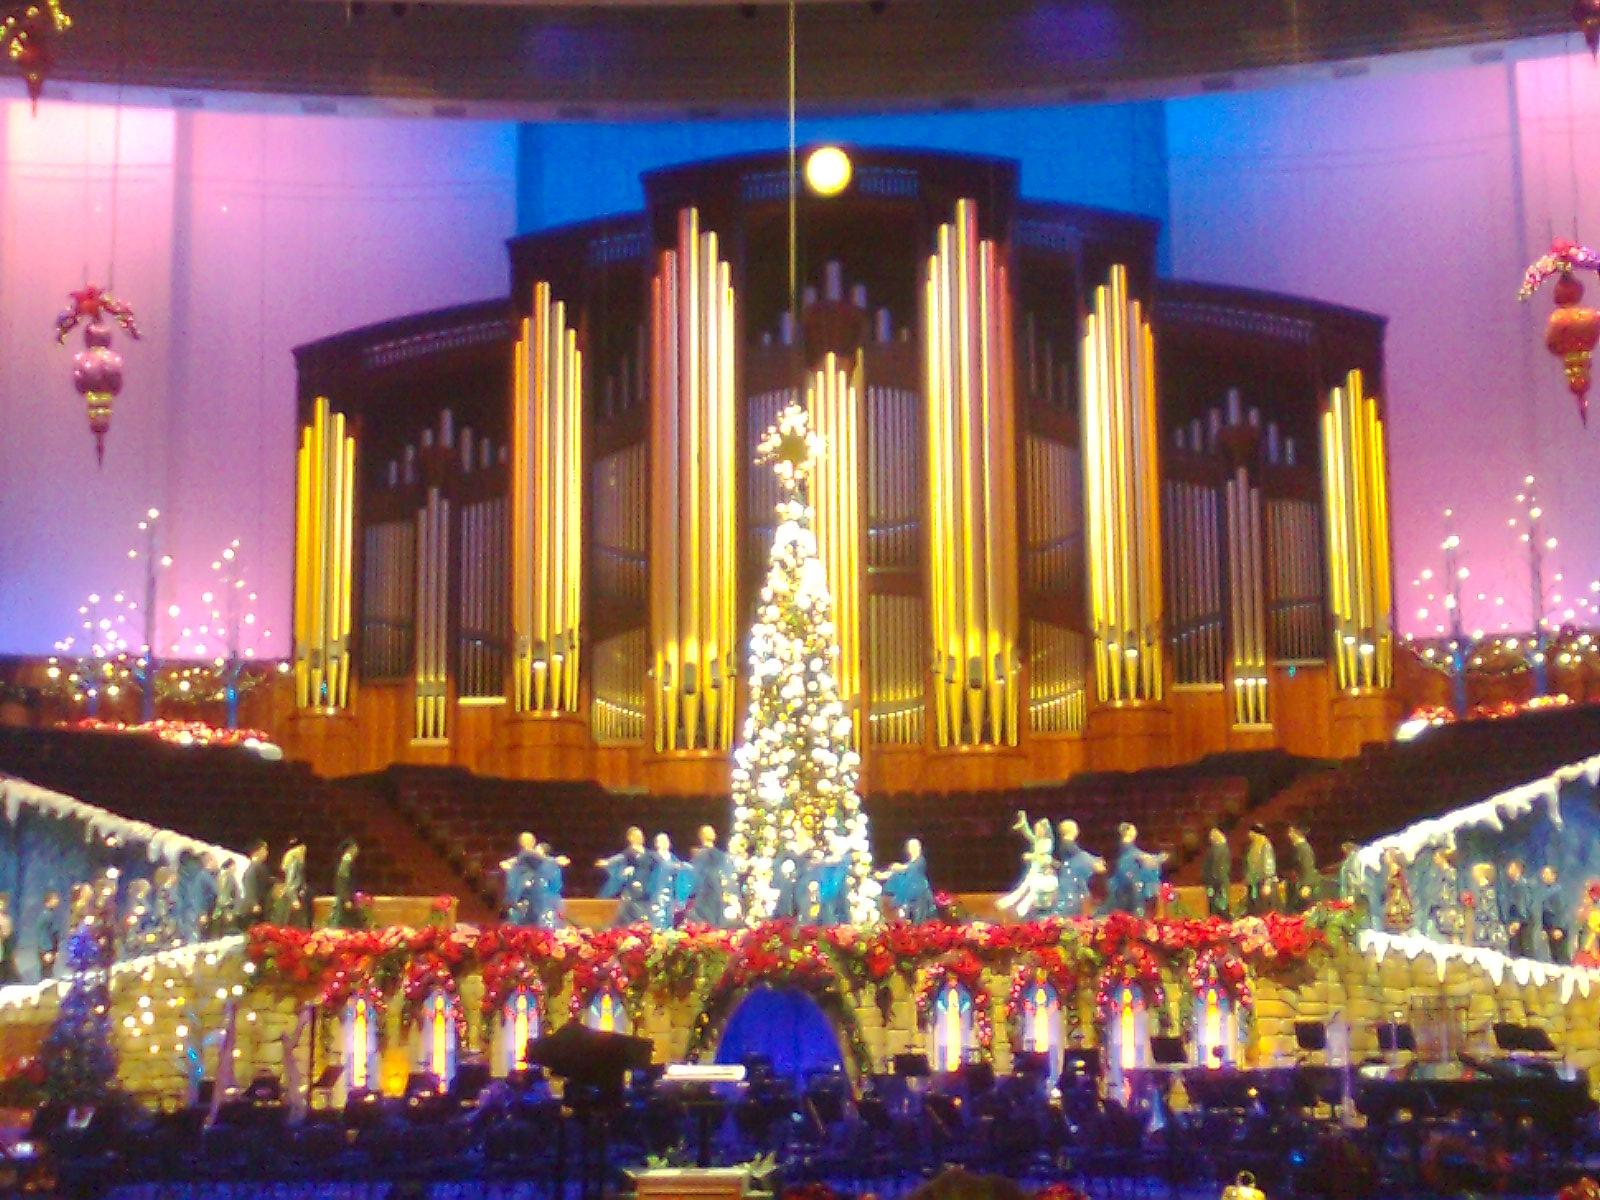 Lds Christmas Concert.Tabernacle Choir Christmas Concert Times Seasons